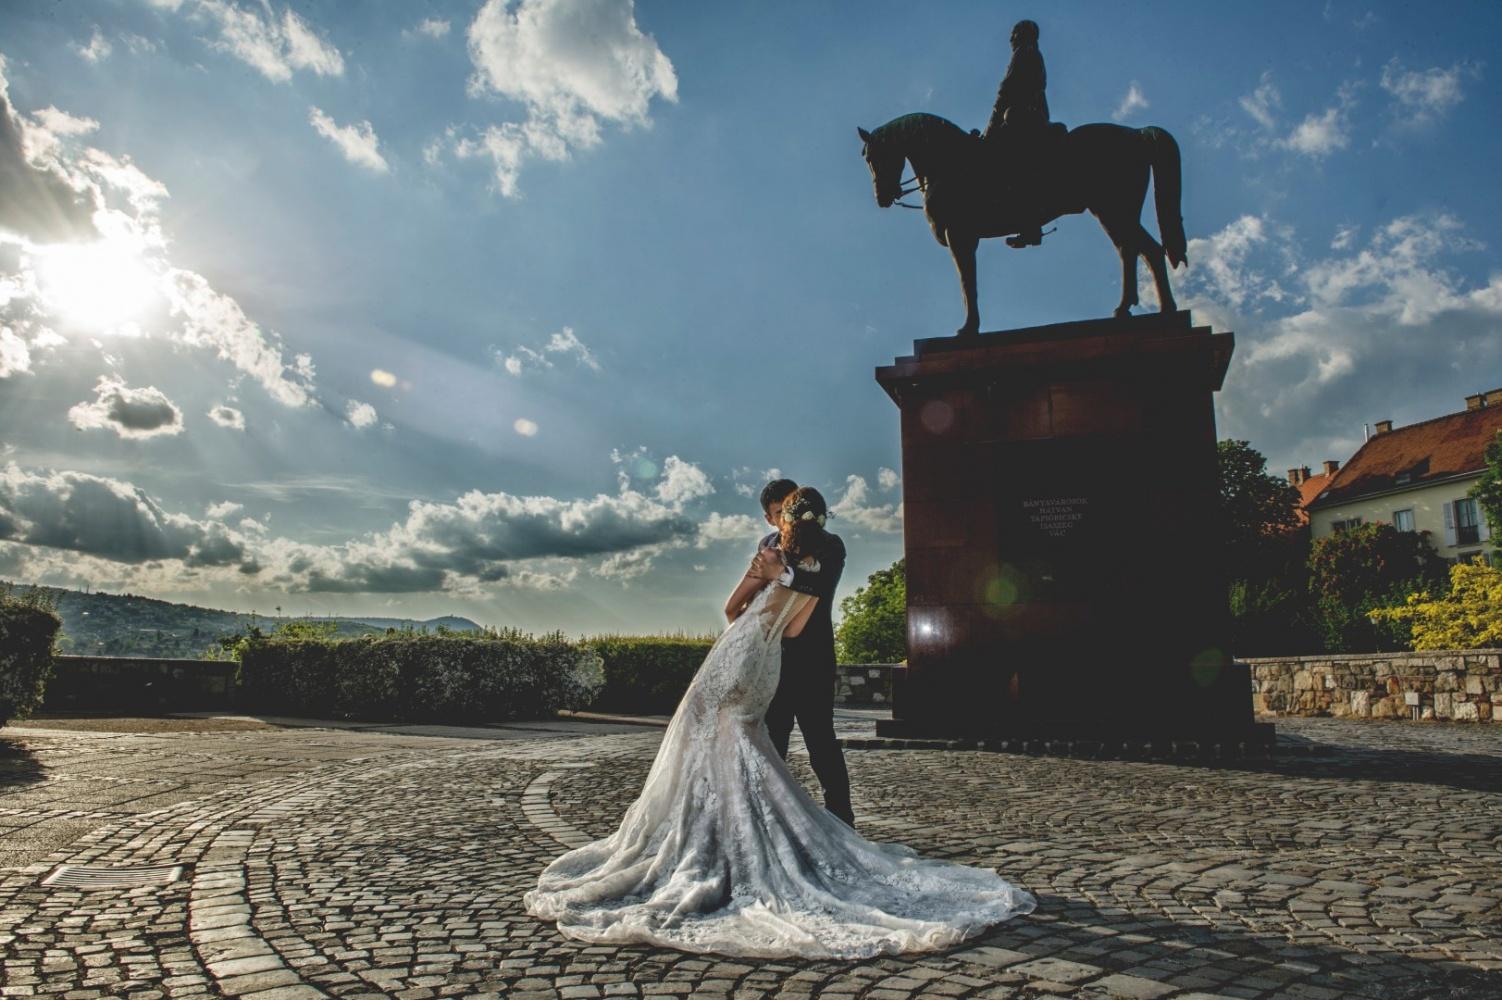 http://www.fotoz.sk/images/gallery-43/normal/svadobny-fotograf_svadobne-fotky_prewedding-budapest_juraj-zsok_eskuvoi-fotos_eskuvoi-fotozas_040.jpg